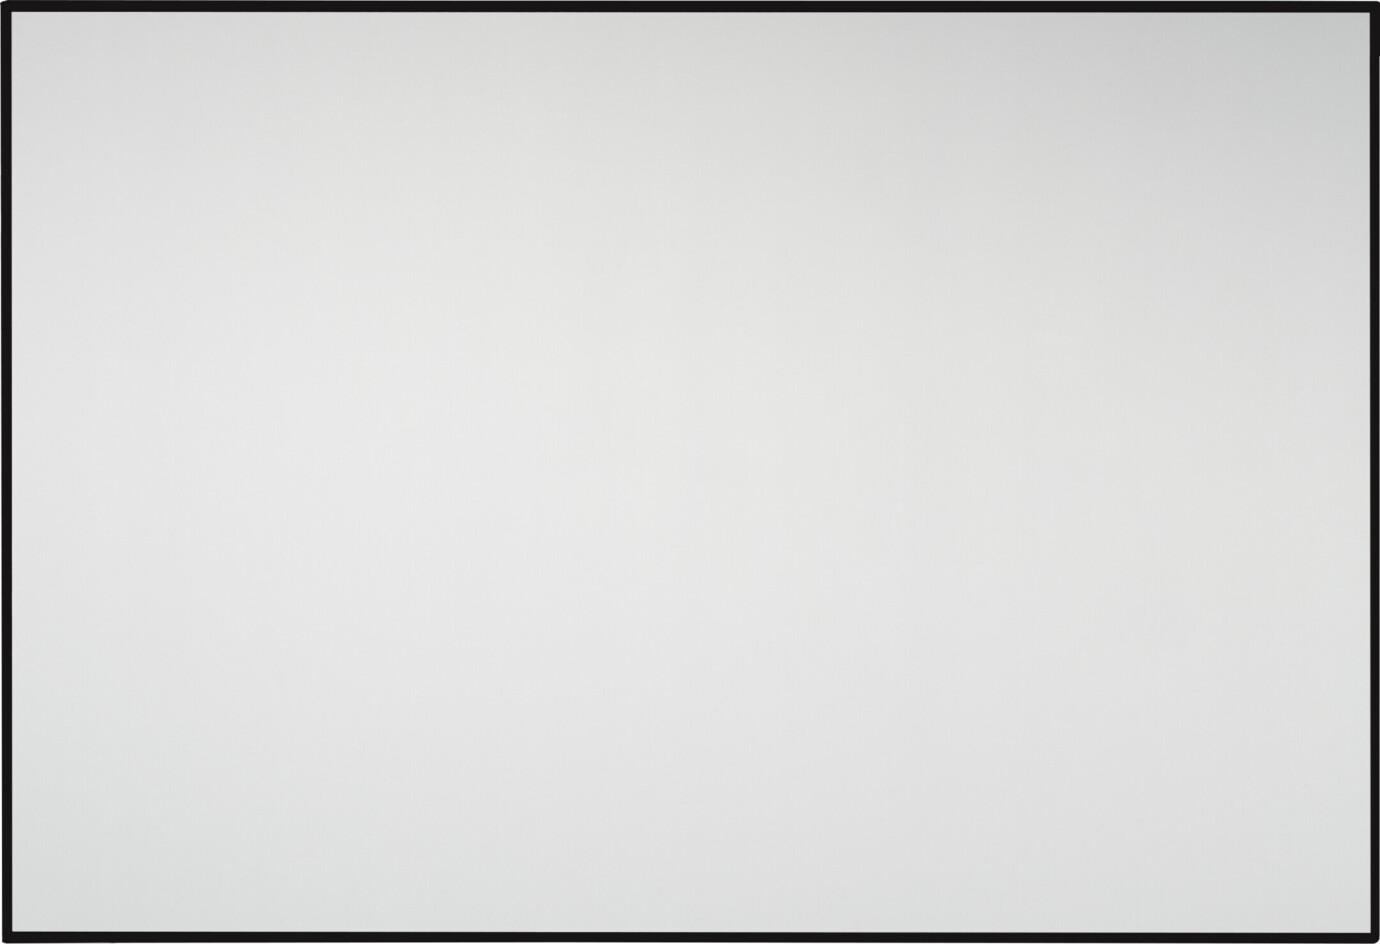 "celexon HomeCinema Hochkontrastleinwand Frame 244 x 137 cm, 110"" - Dynamic Slate ALR"